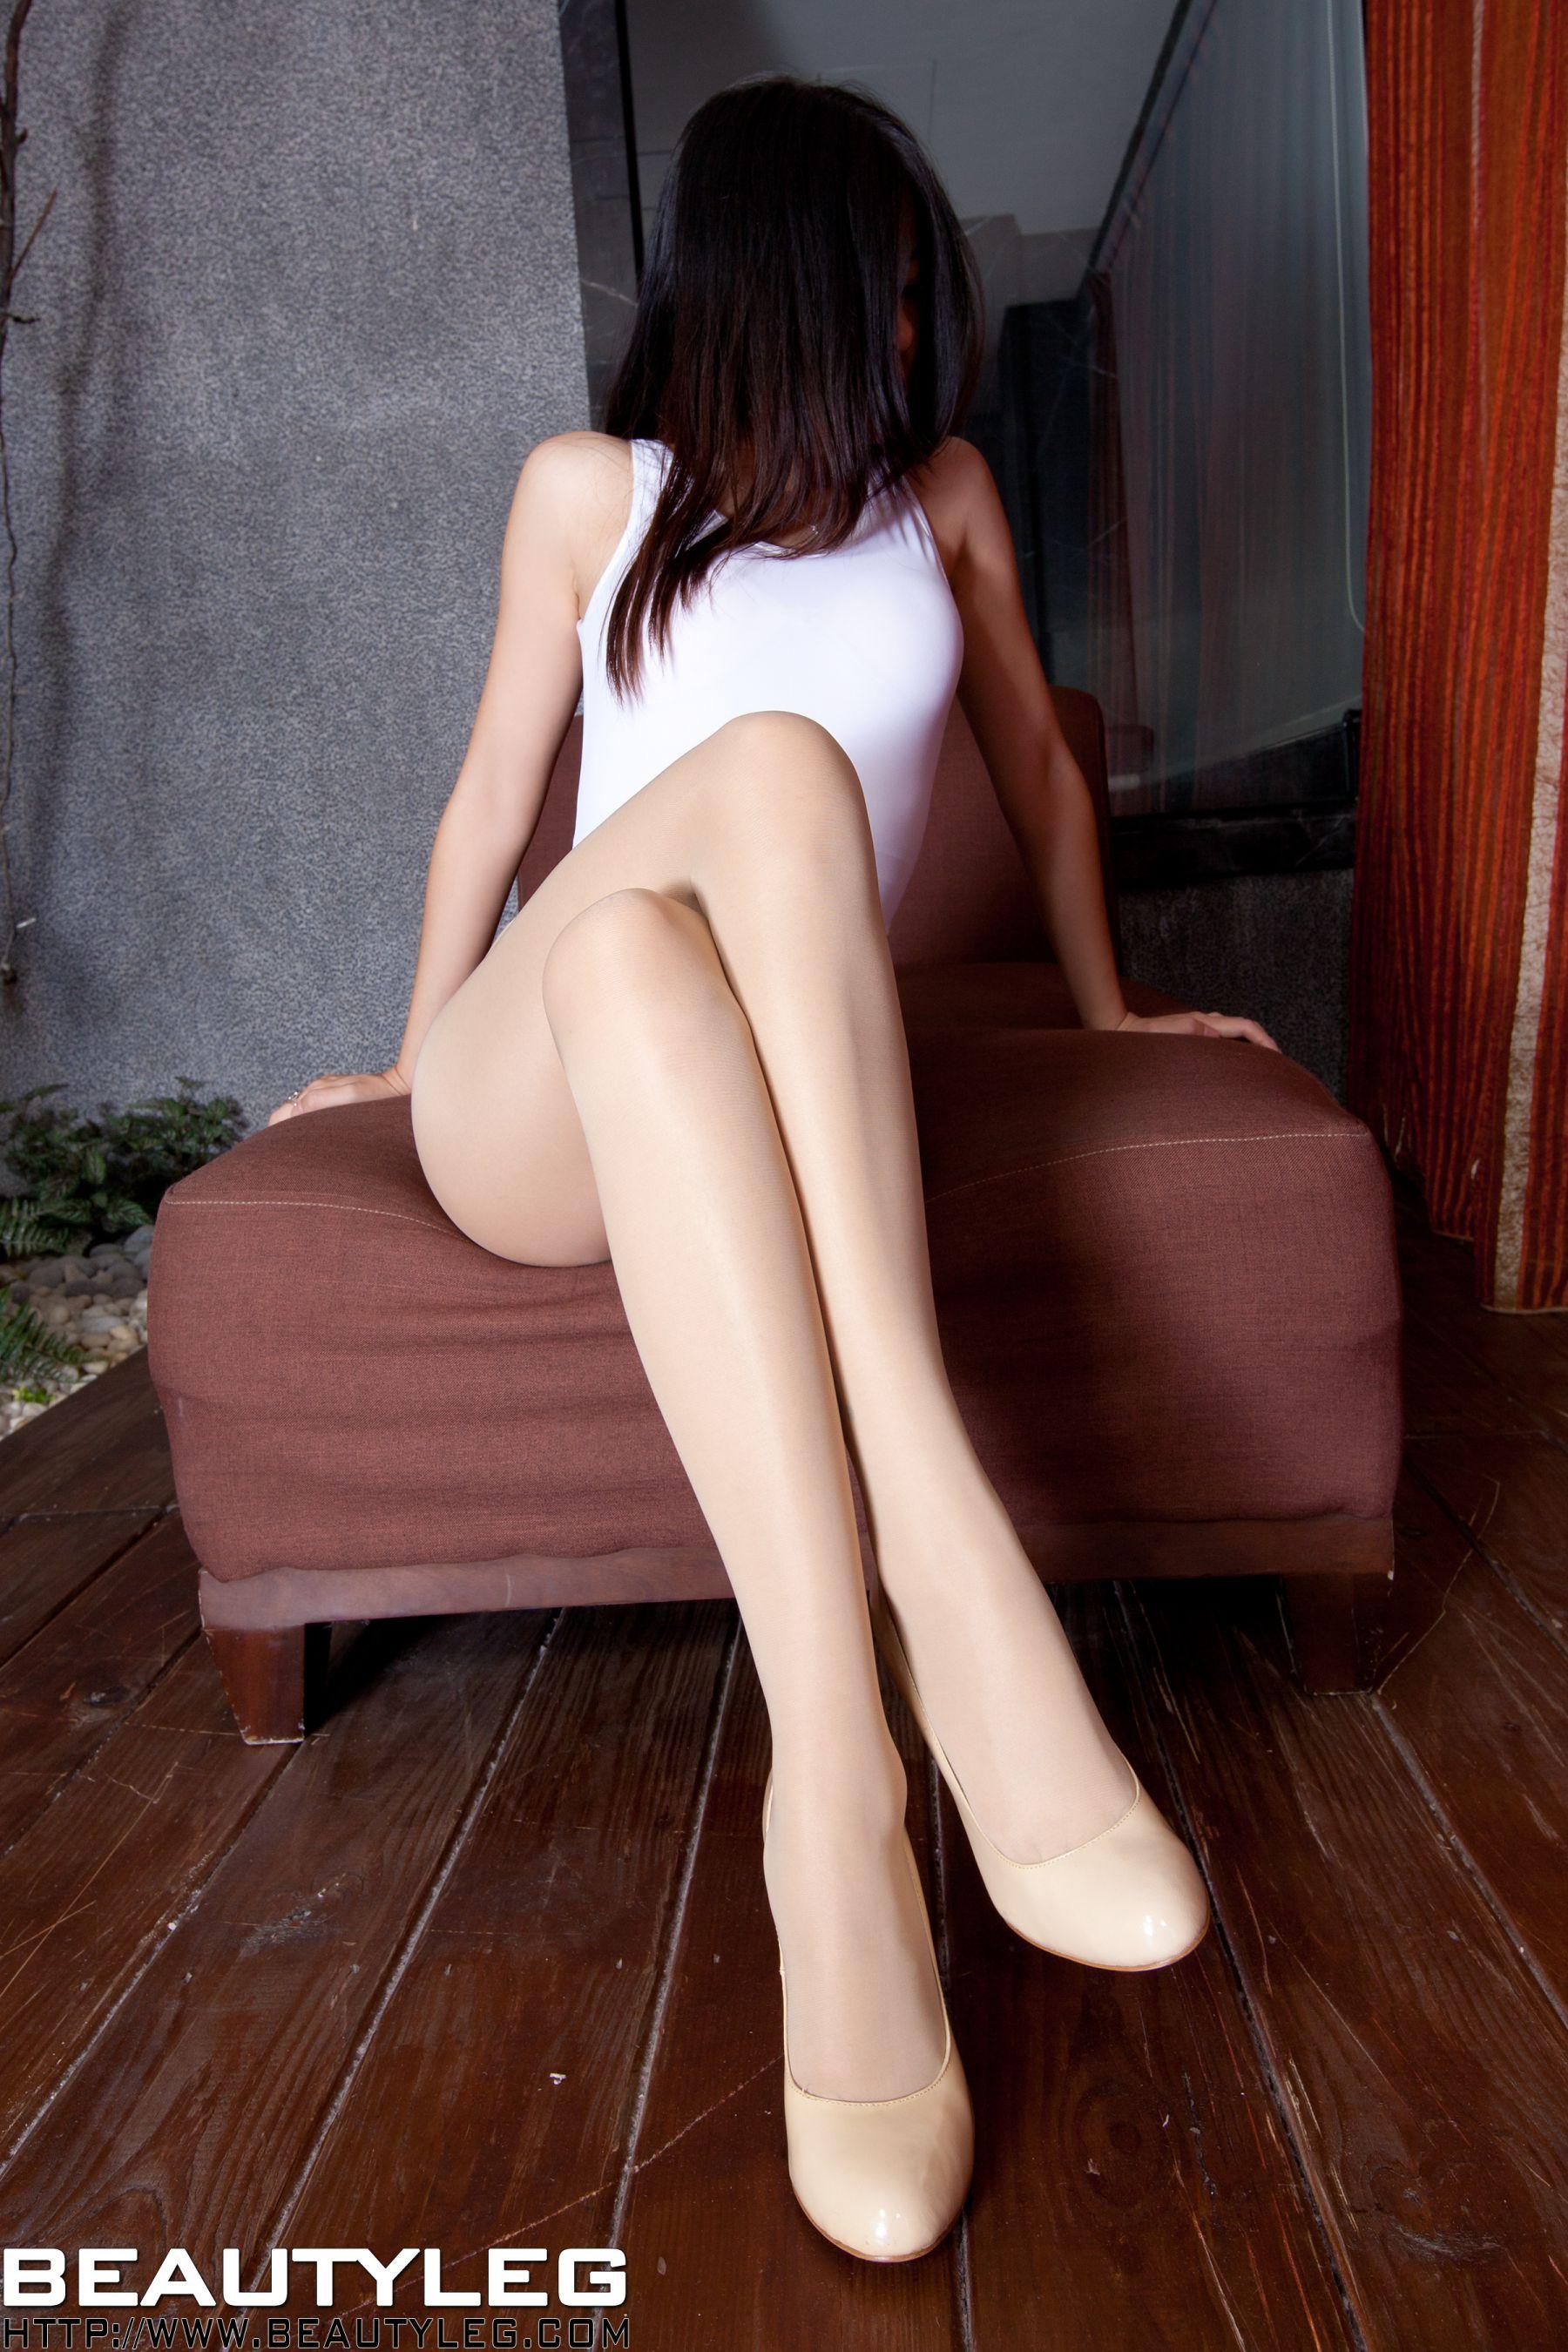 VOL.1702 [Beautyleg]高叉泳装高跟美腿:腿模Sabrina高品质写真套图(40P)